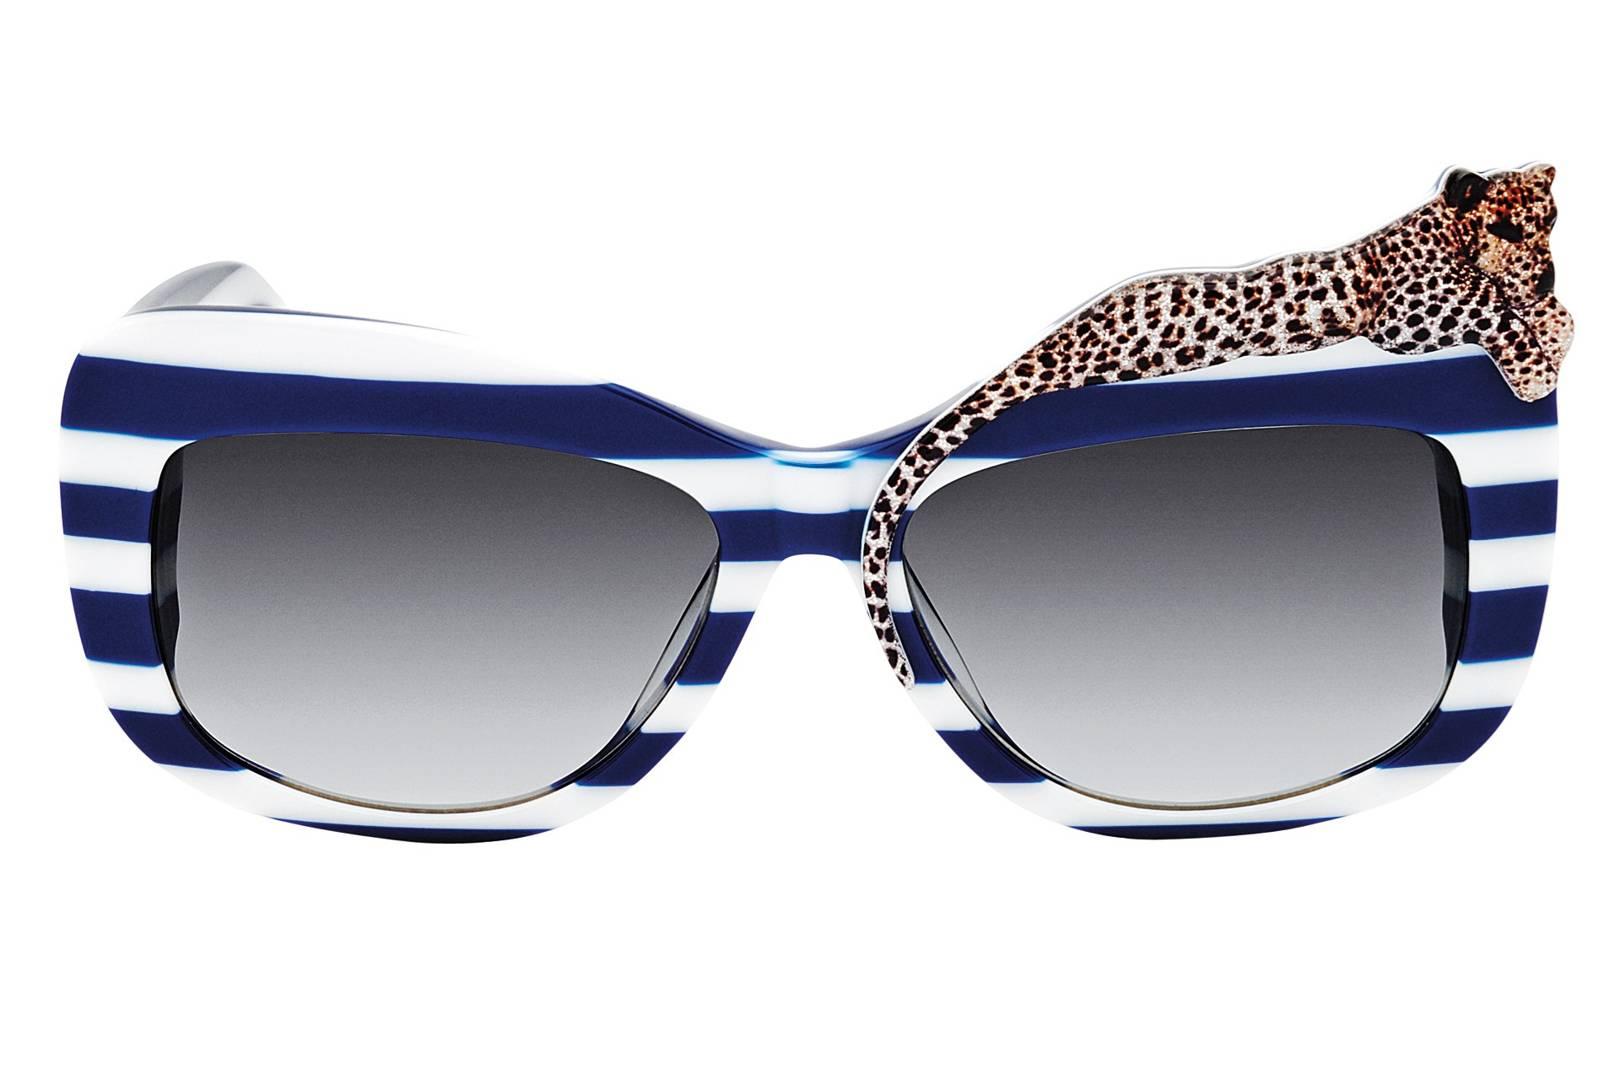 5111379ee5b Designer sunglasses 2016